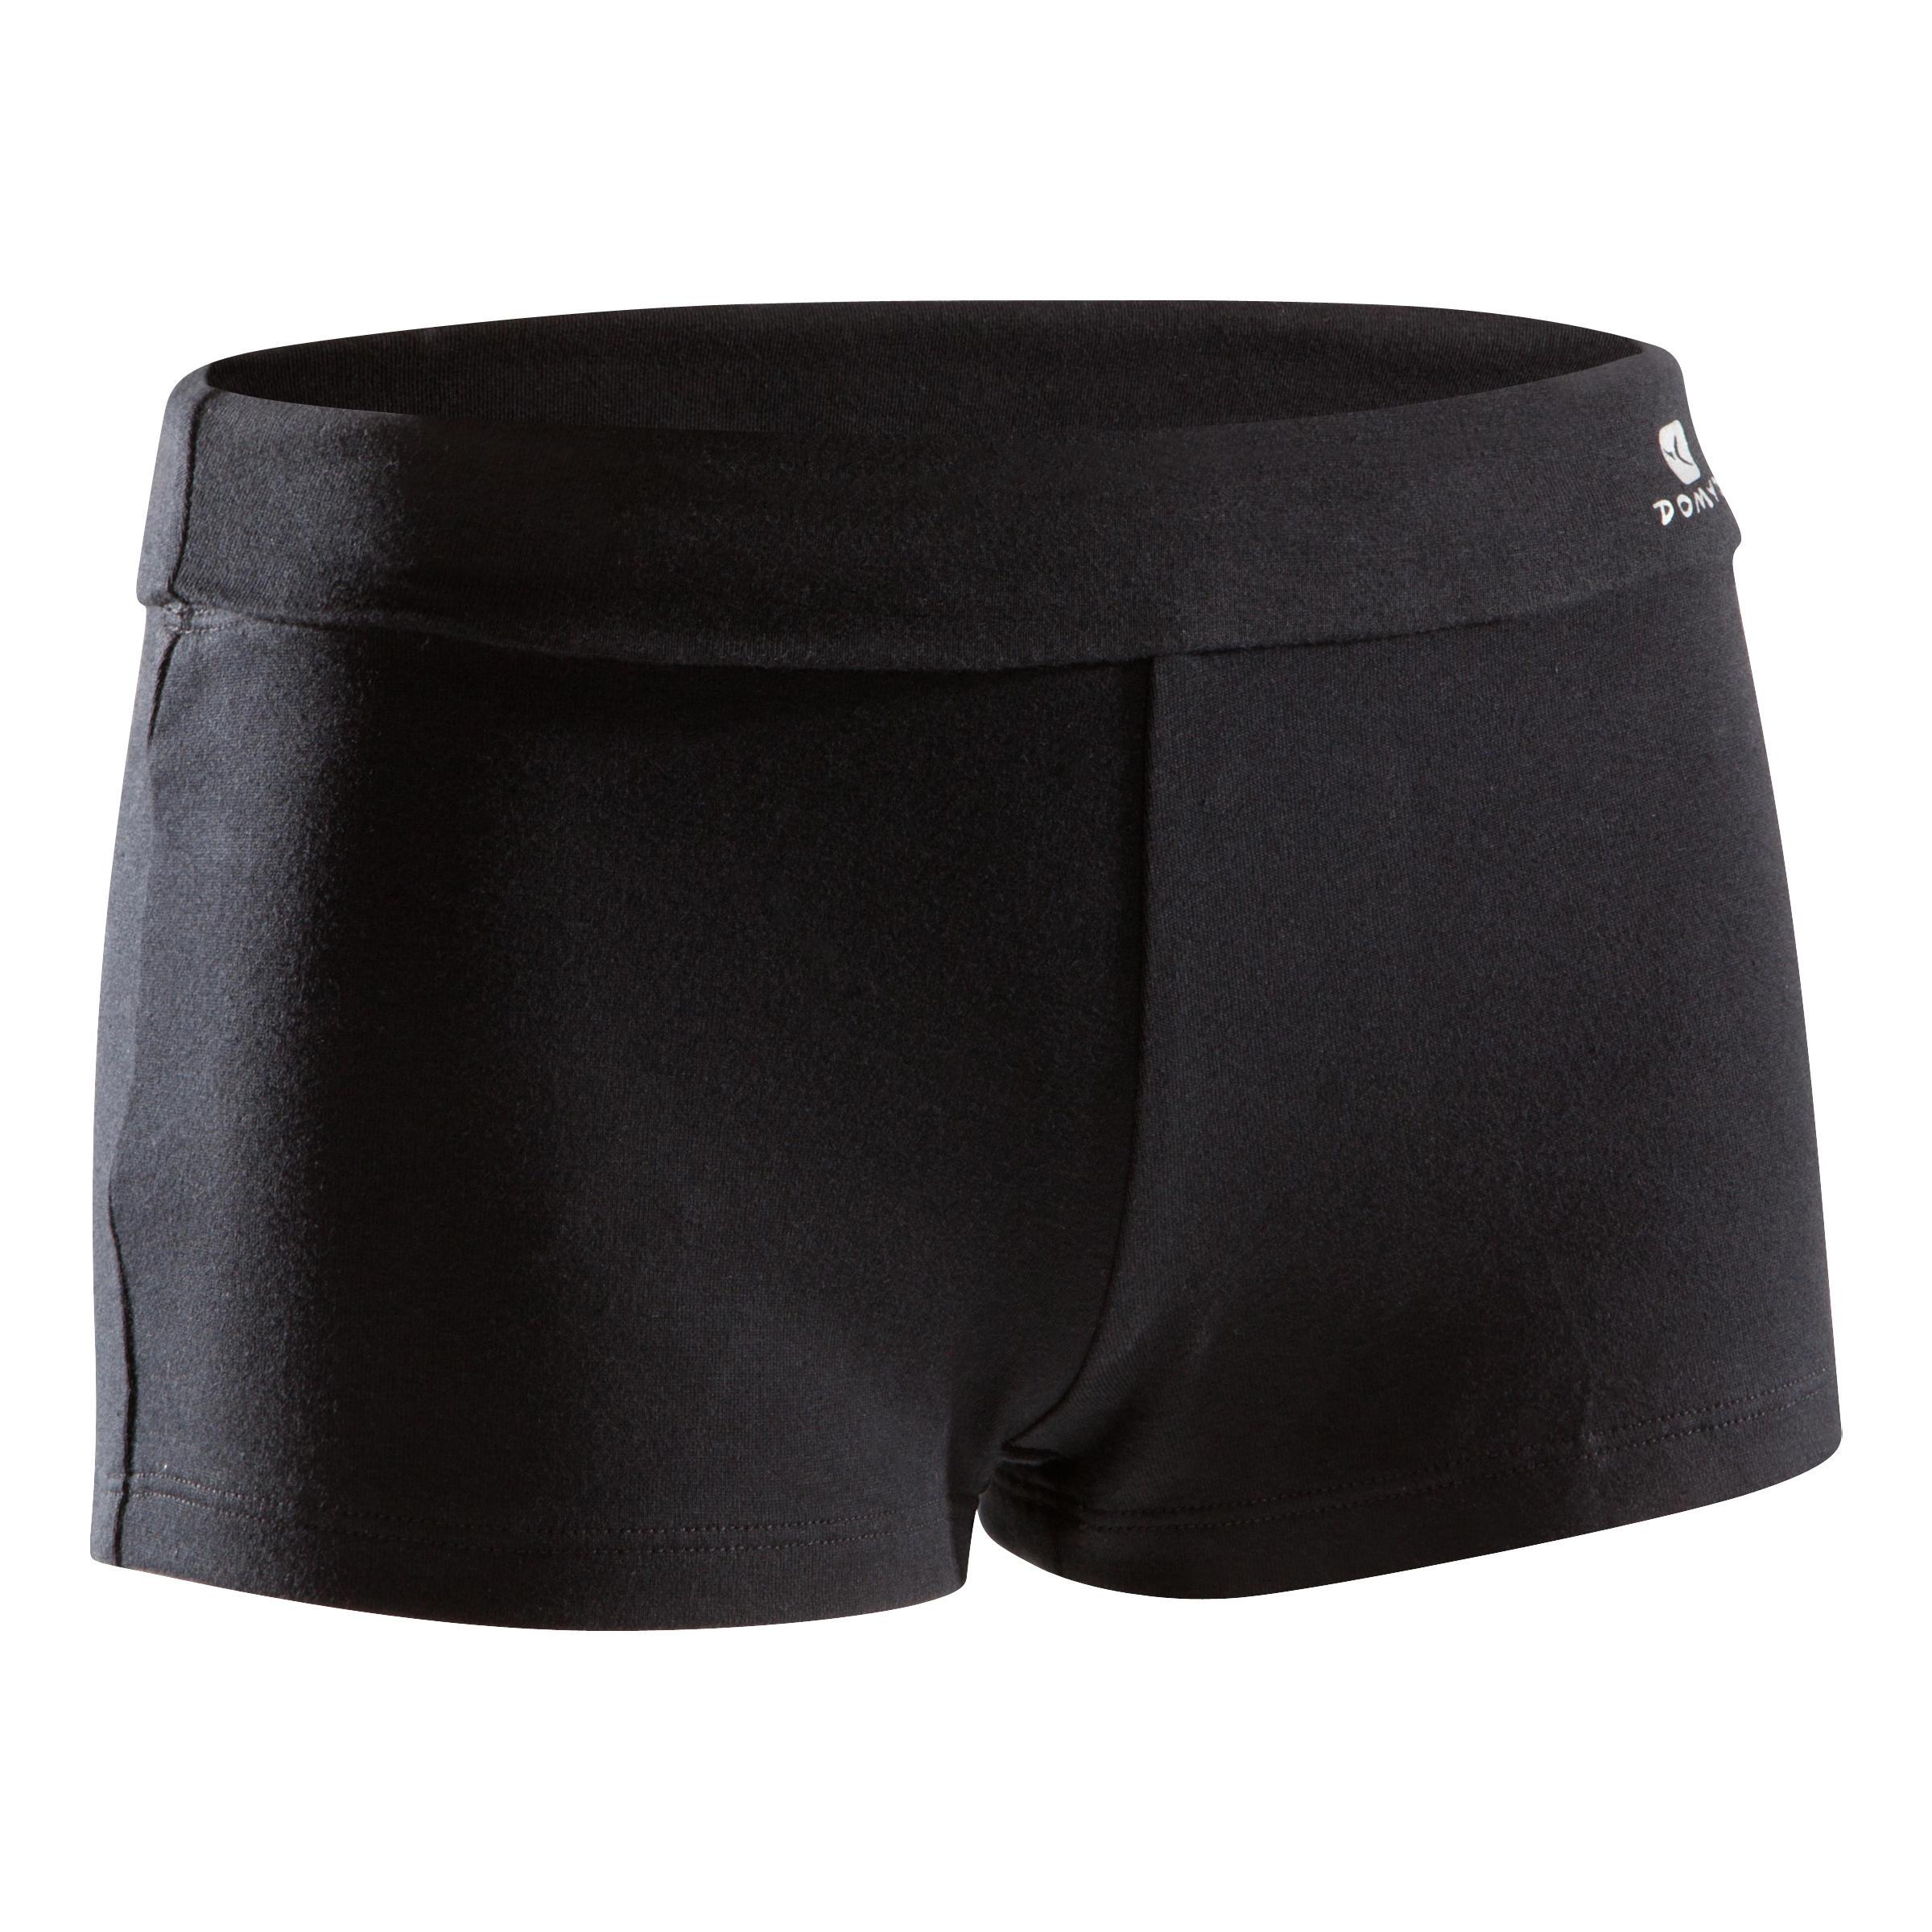 Girls' Mini Dance Shorts - Black